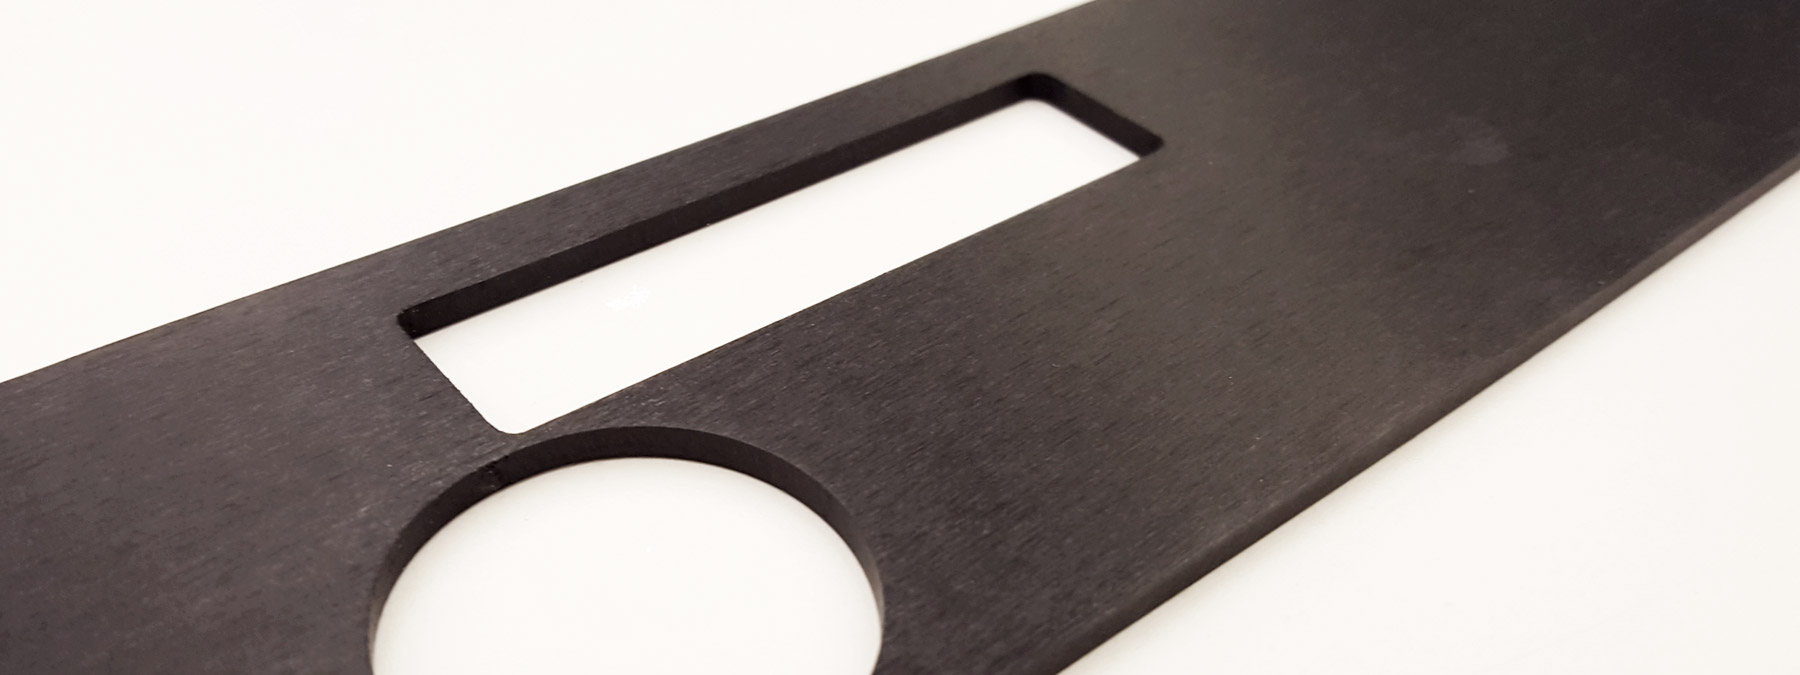 Anodized Aluminum - Black Dye